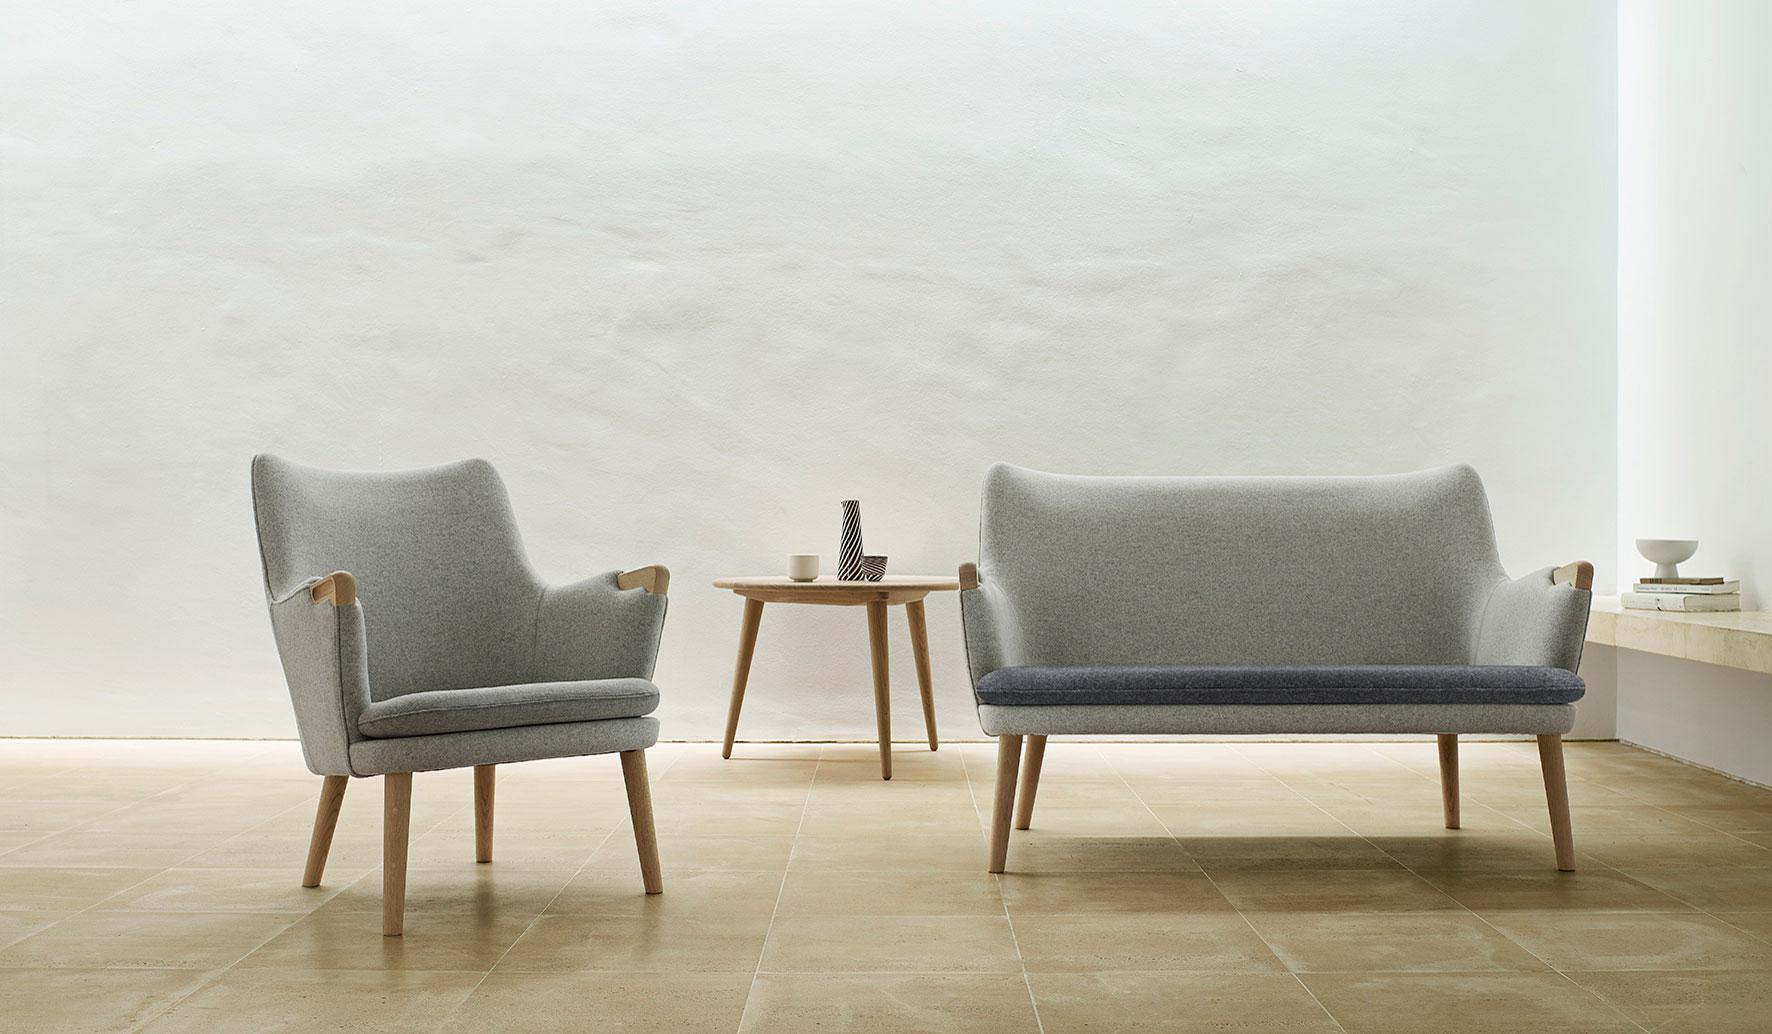 CARL HANSEN & SØN|ウェグナーによる造形美と職人技巧の結晶。幻の二脚が復刻